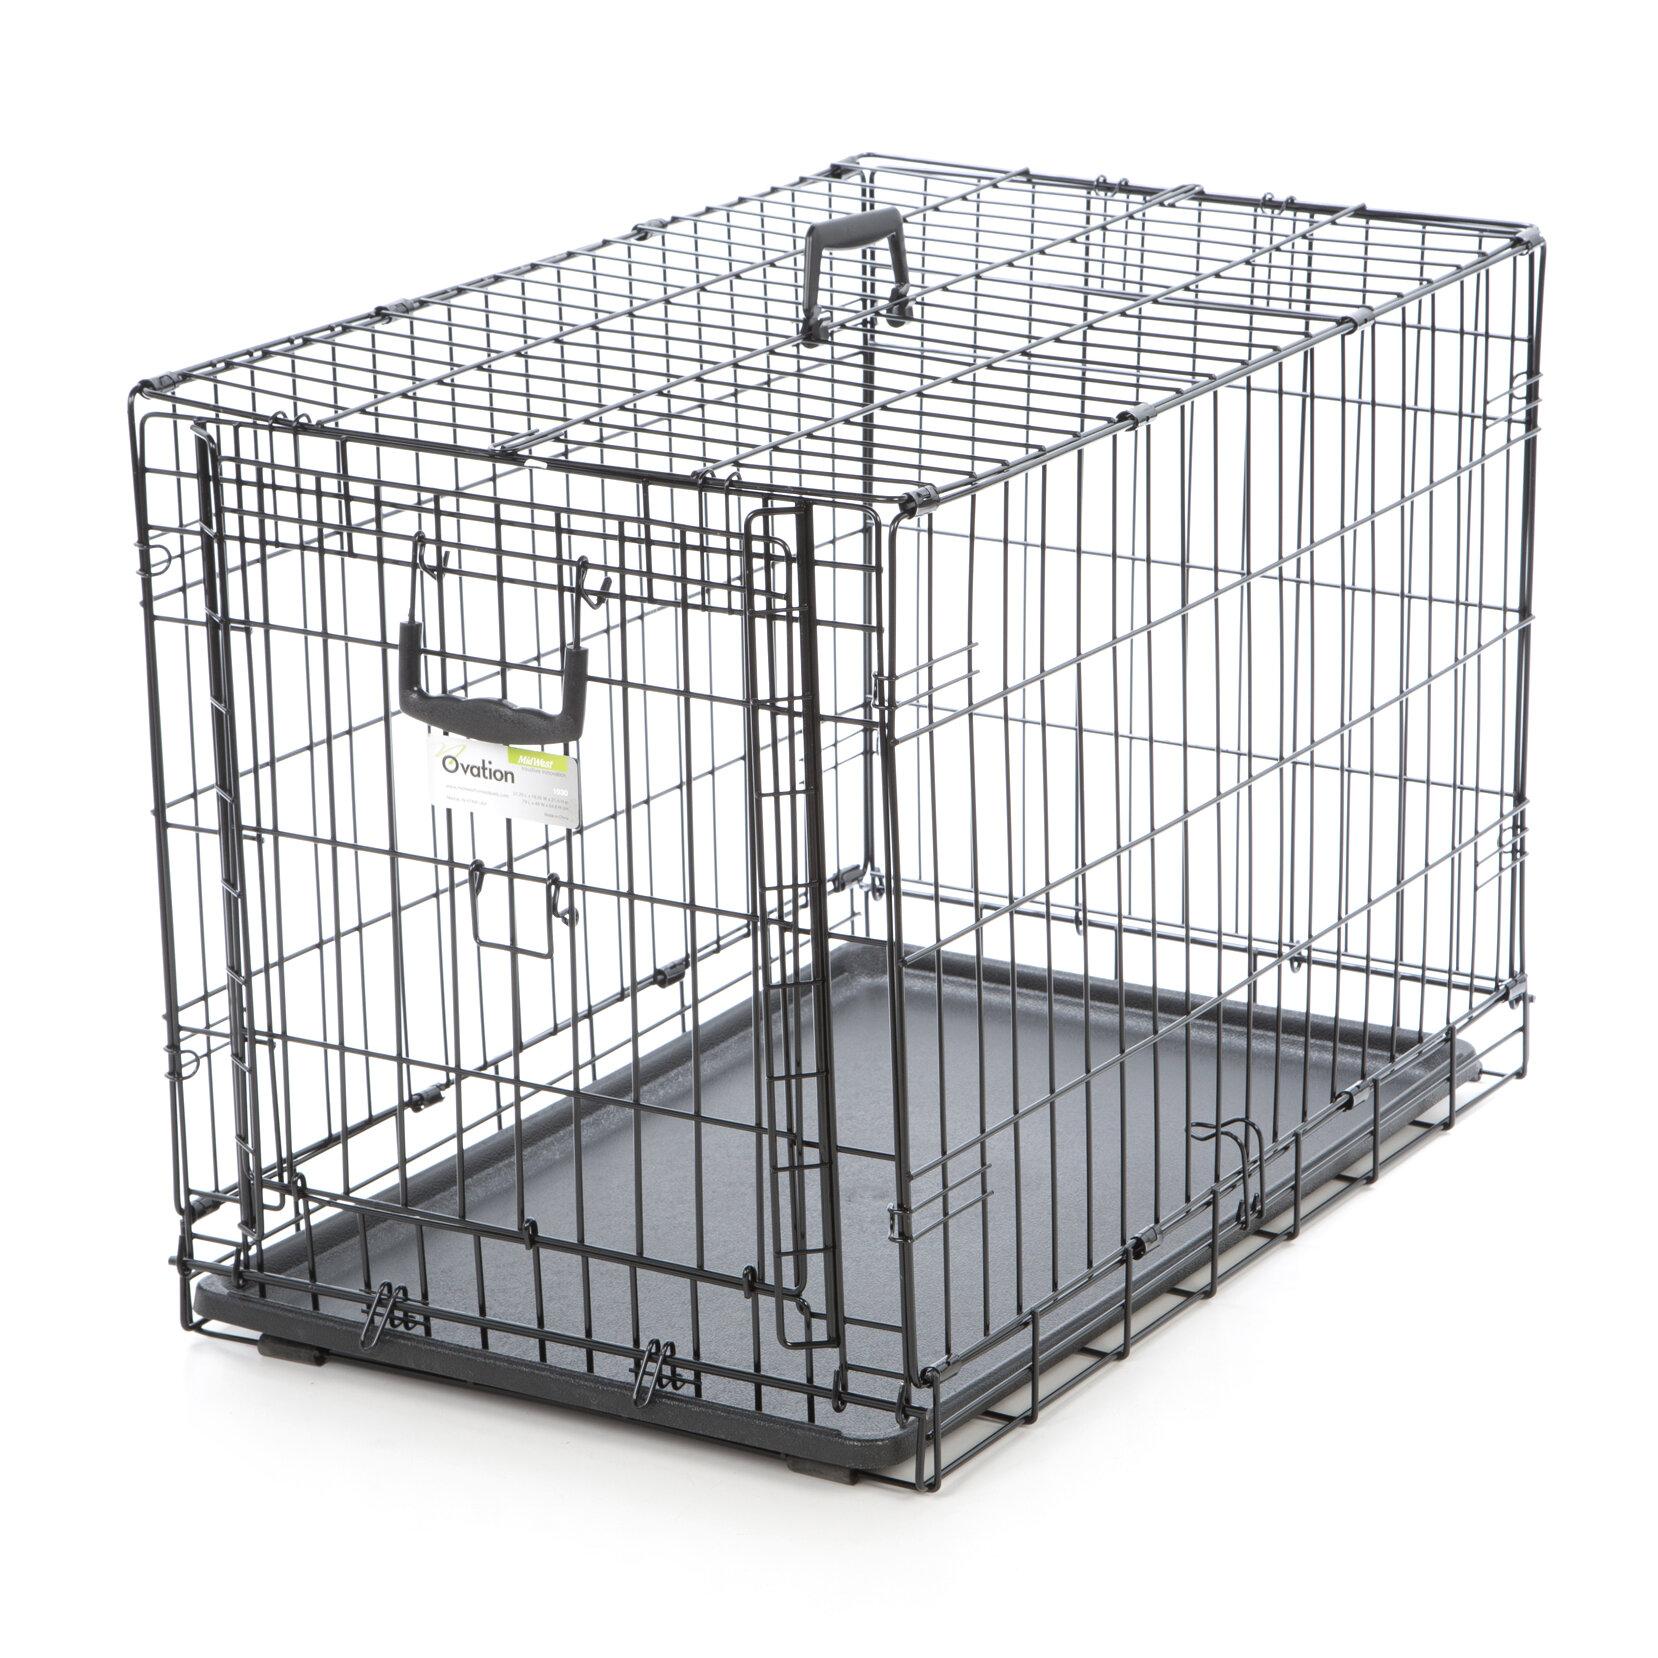 Midwest Homes For Pets Ovation Single Door Pet Crate U0026 Reviews | Wayfair